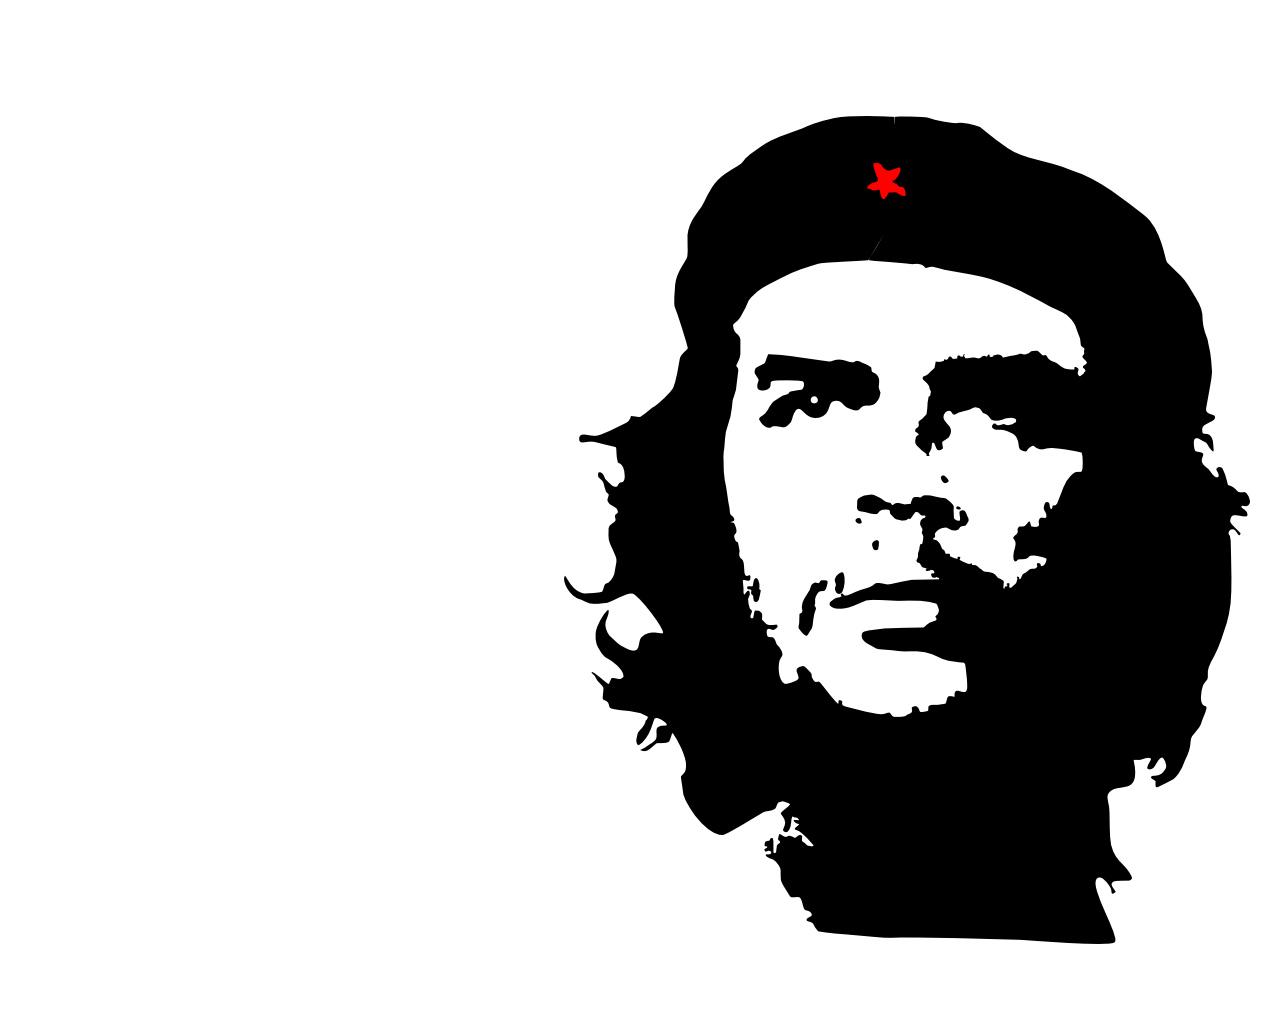 Che Guevara by velenux